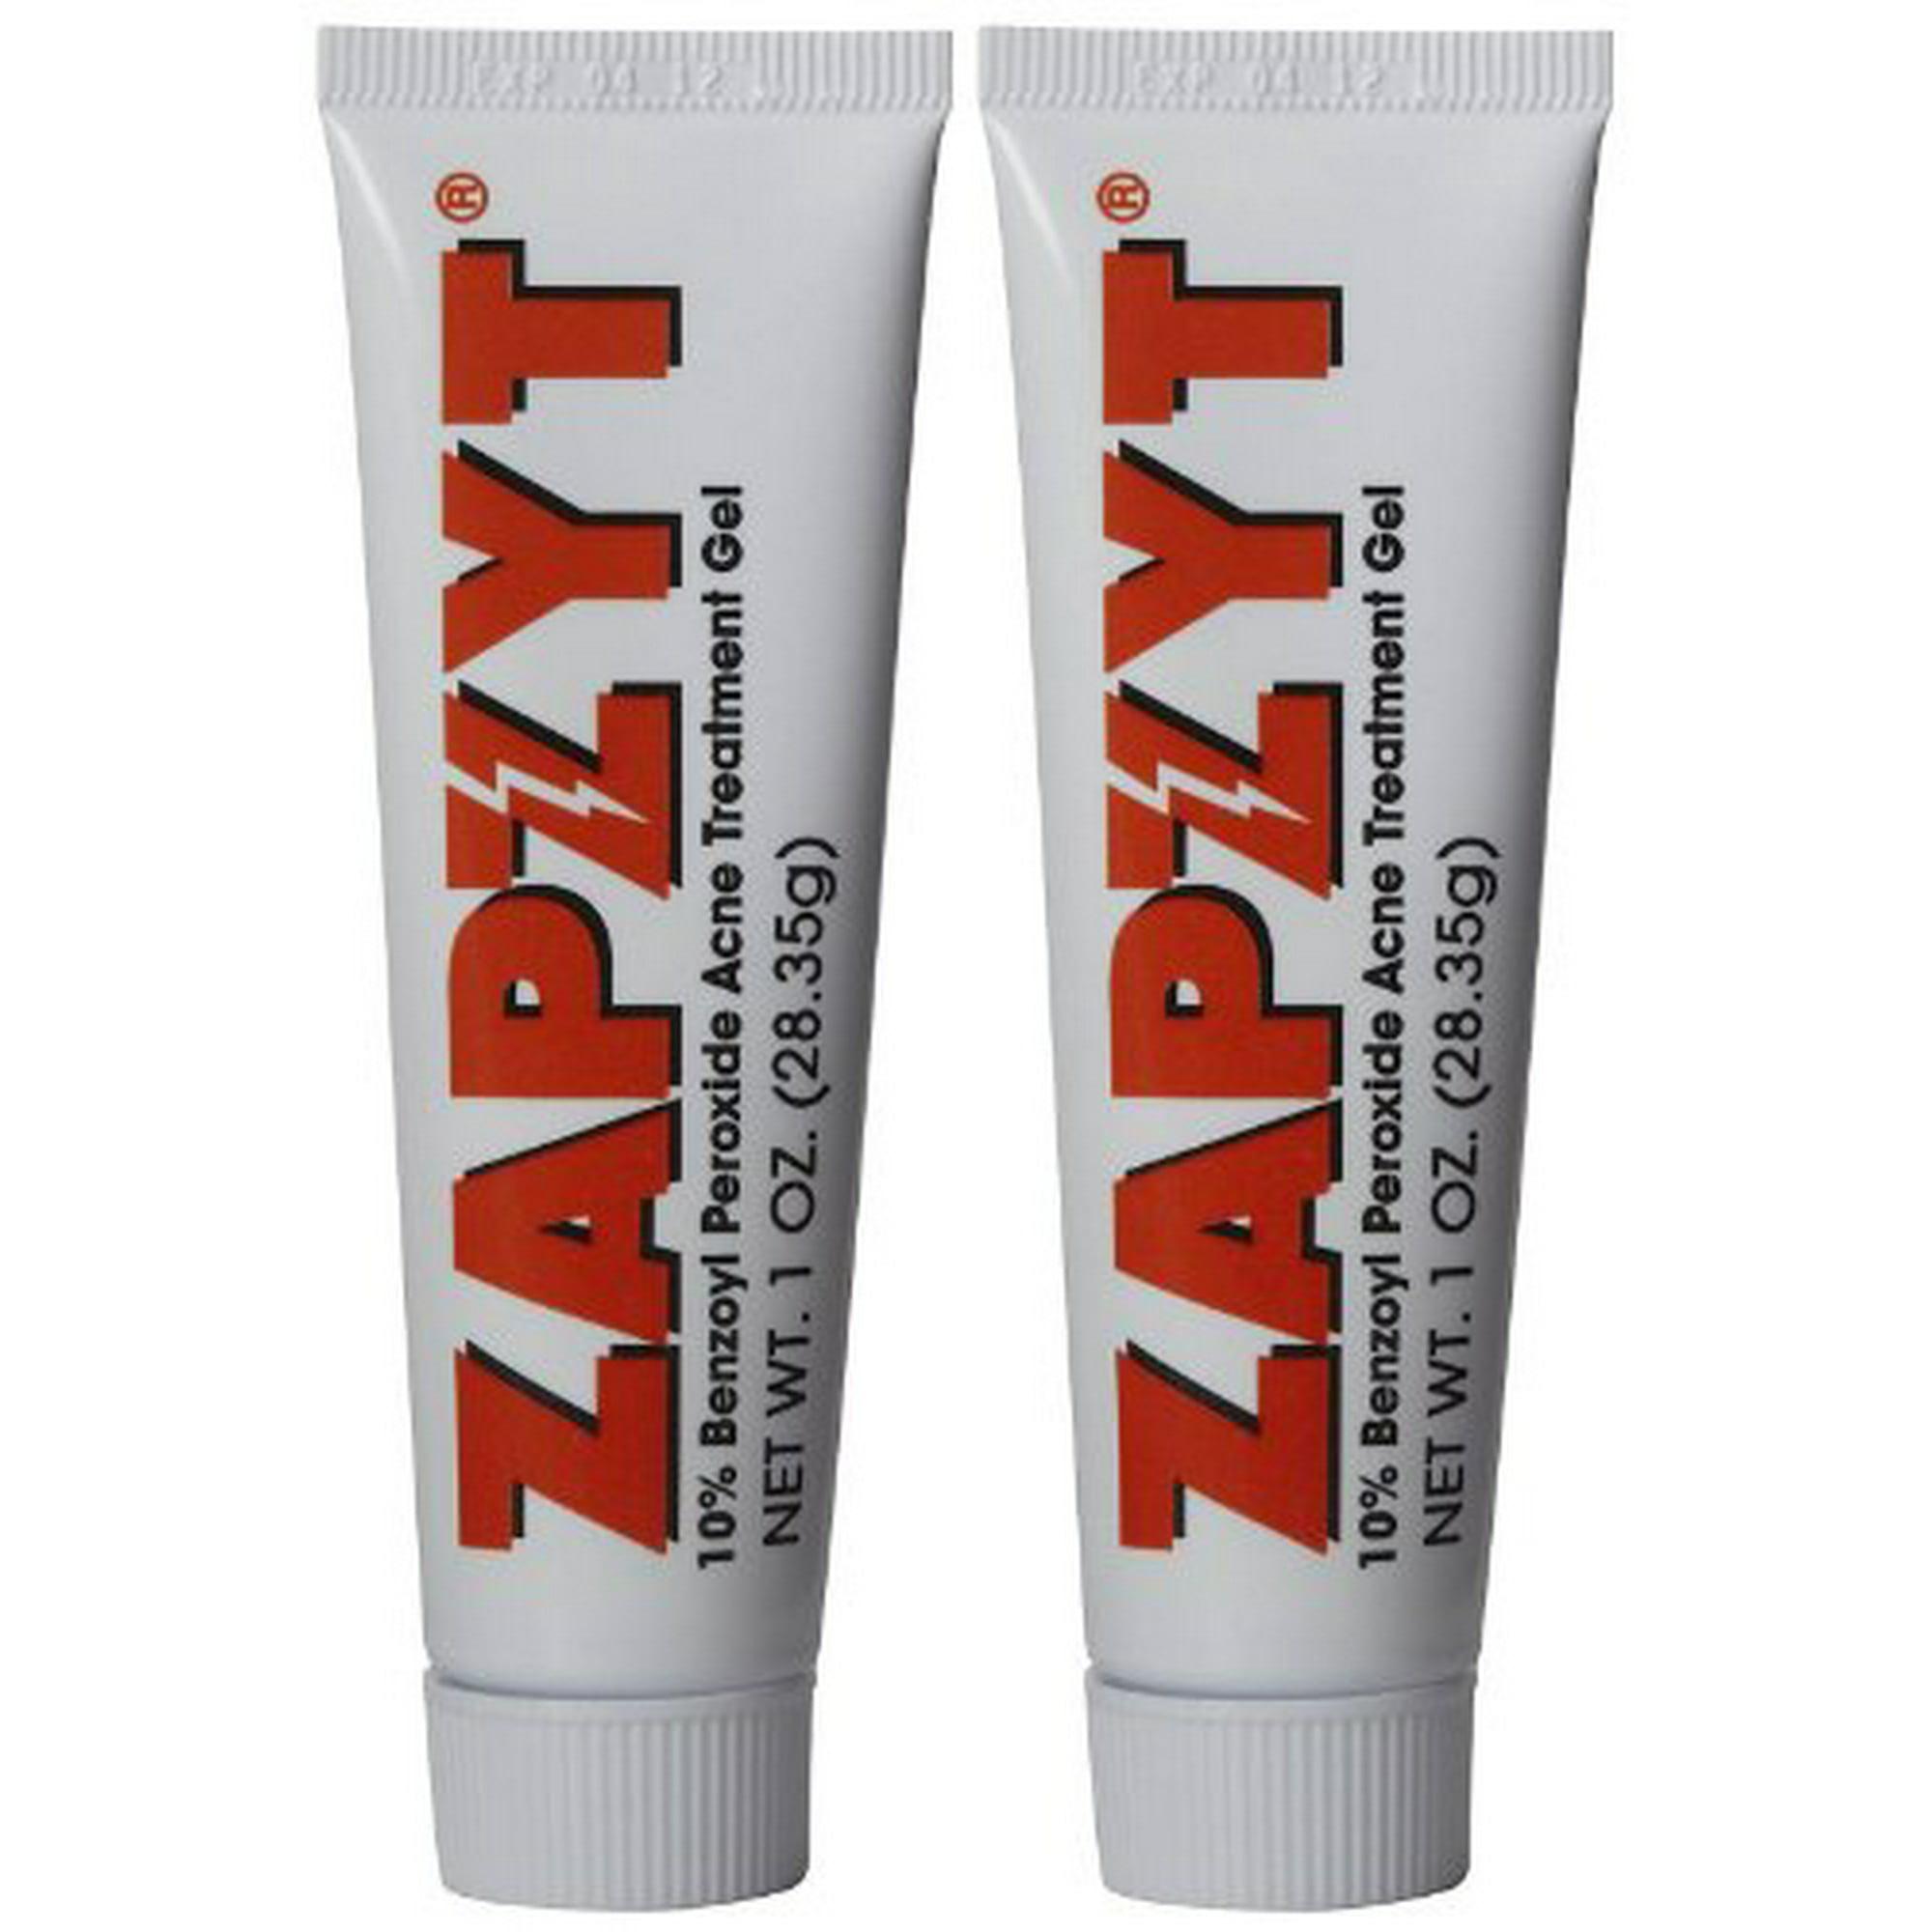 Zapzyt Acne Treatment Gel 1 Oz 2 Pk Walmart Canada